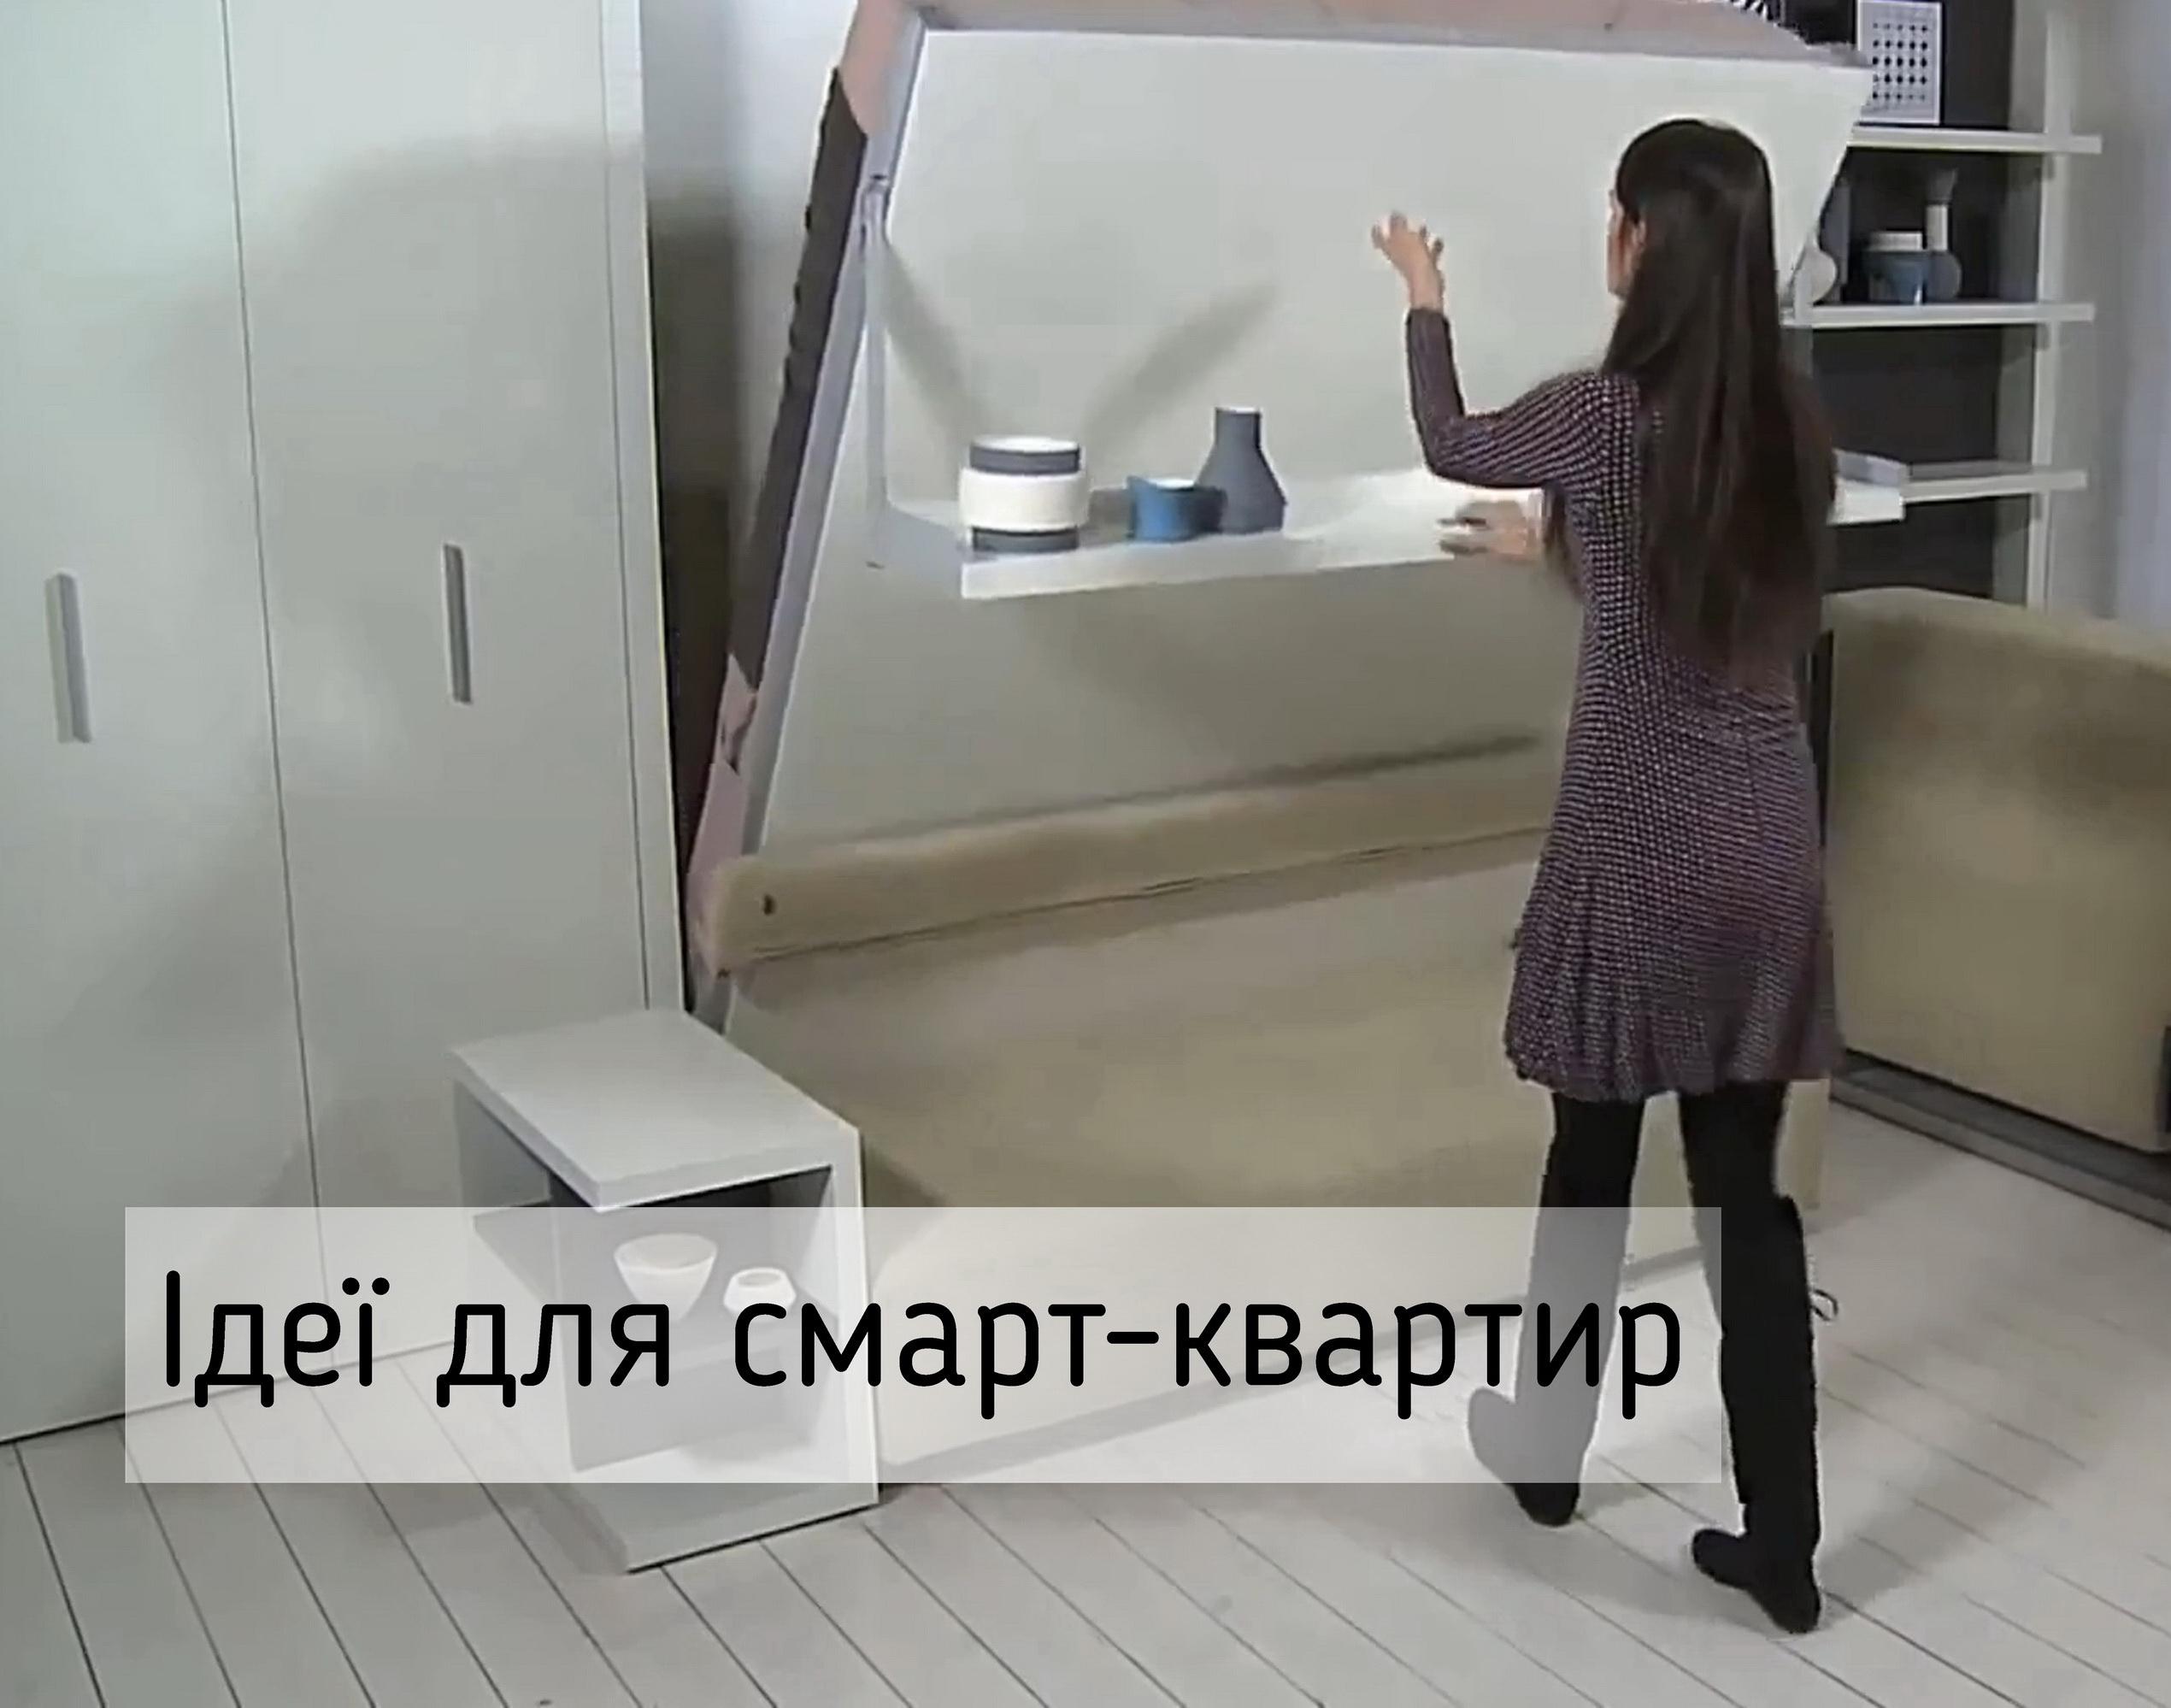 BT_qhNH6474